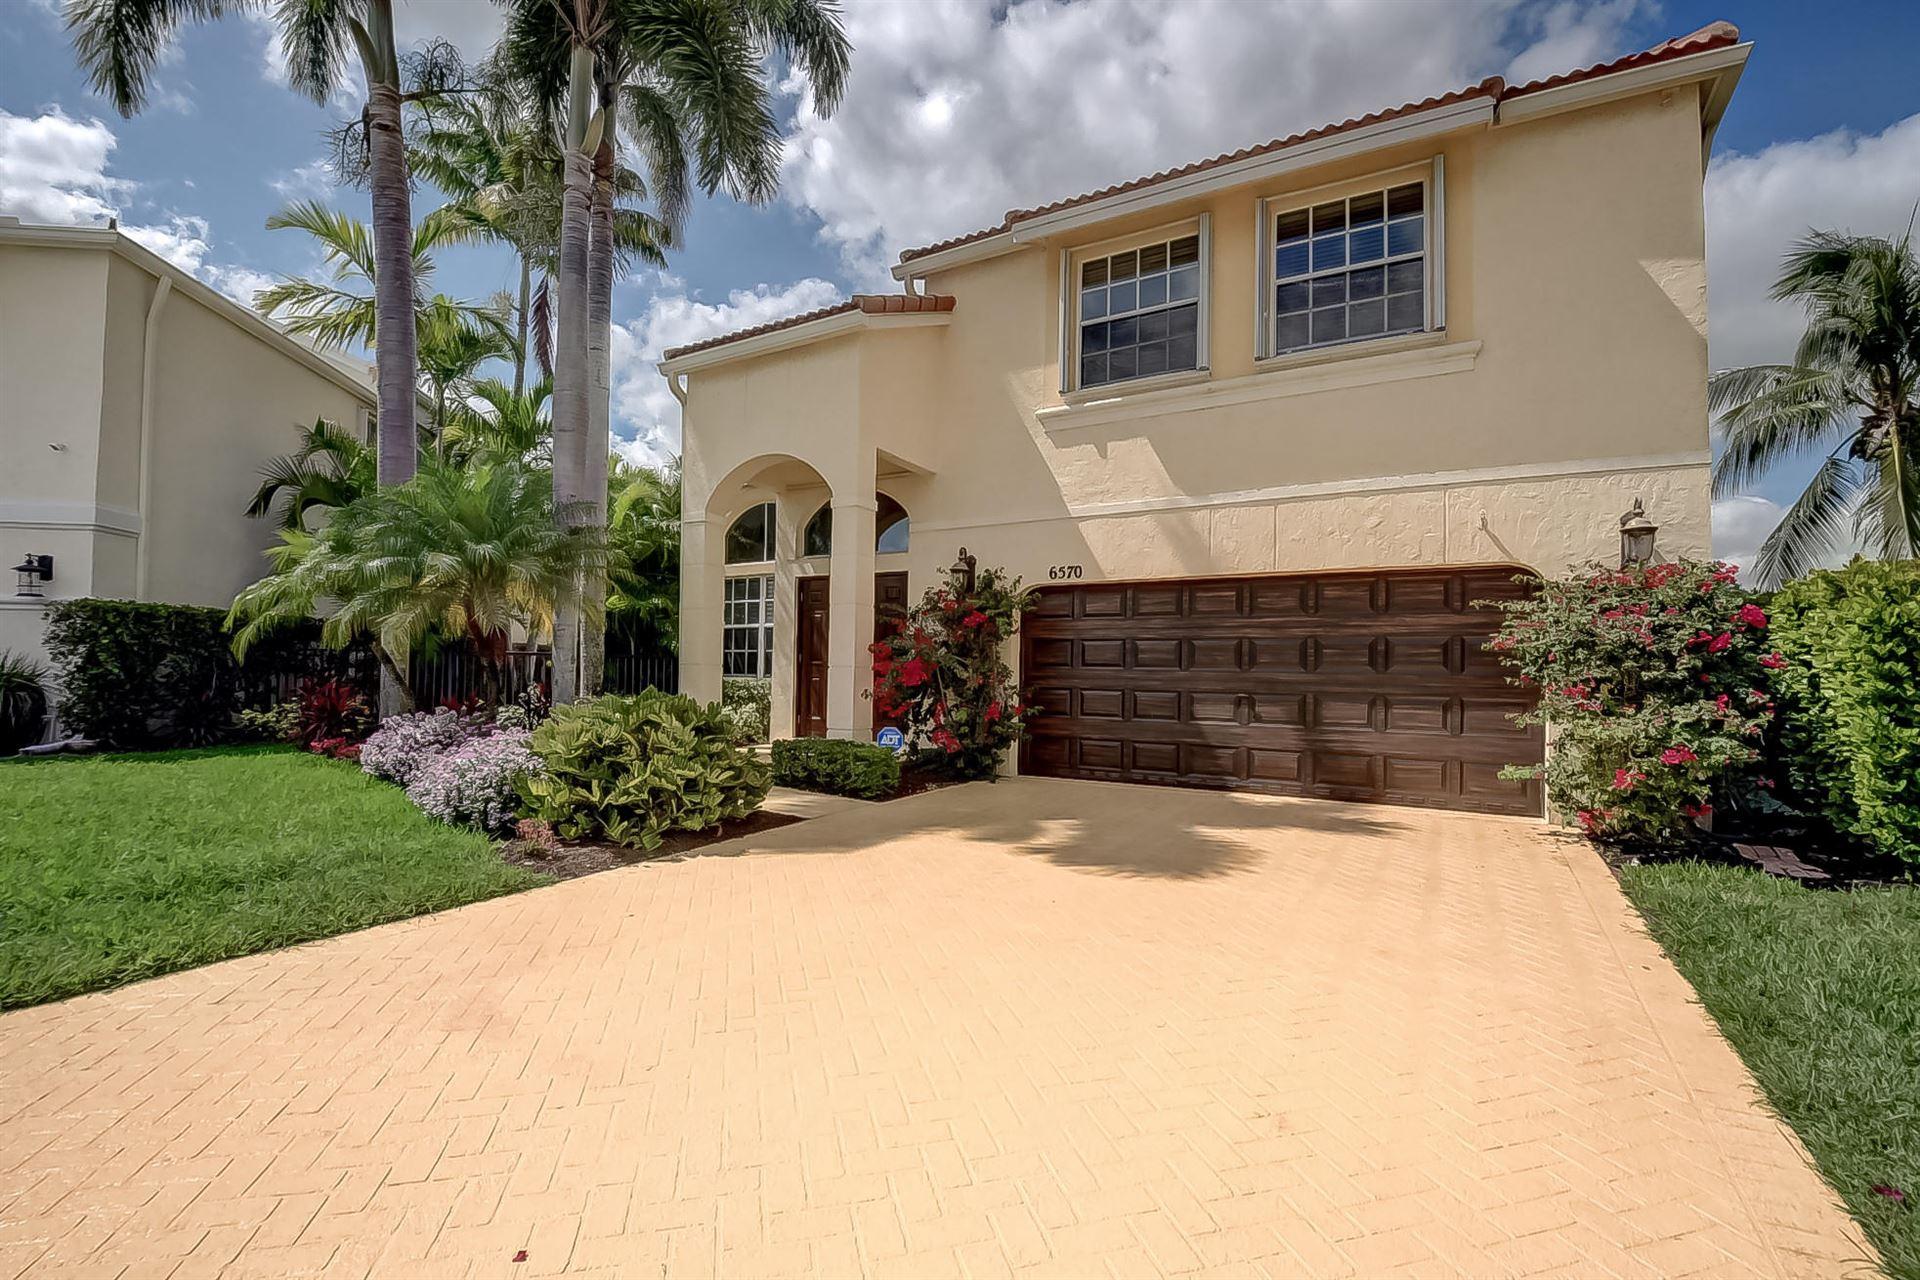 Photo of 6570 Waverly Lane, Lake Worth, FL 33467 (MLS # RX-10709753)